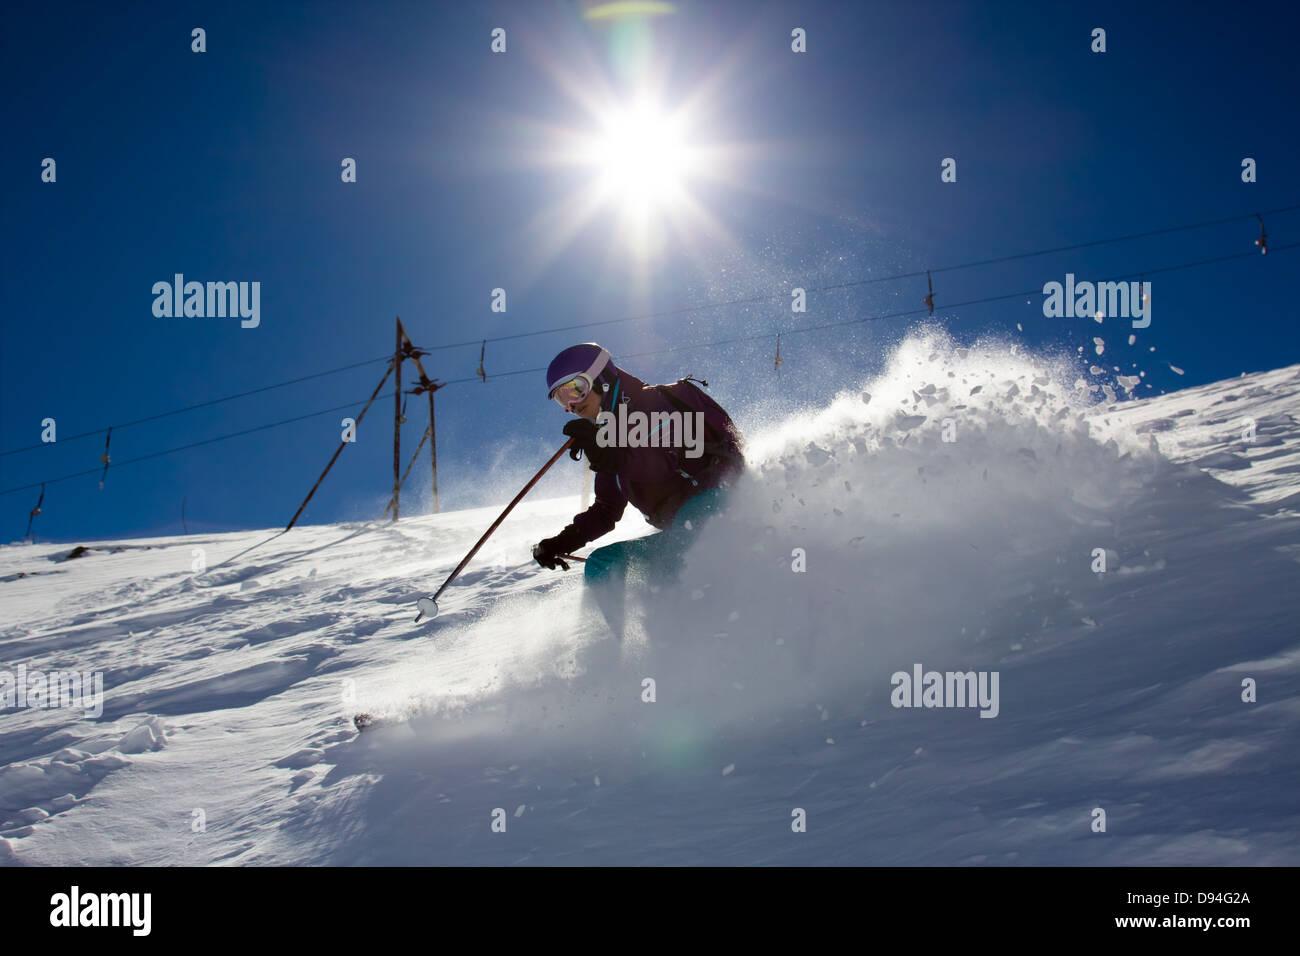 Old Ski Lift Stockfotos & Old Ski Lift Bilder - Alamy